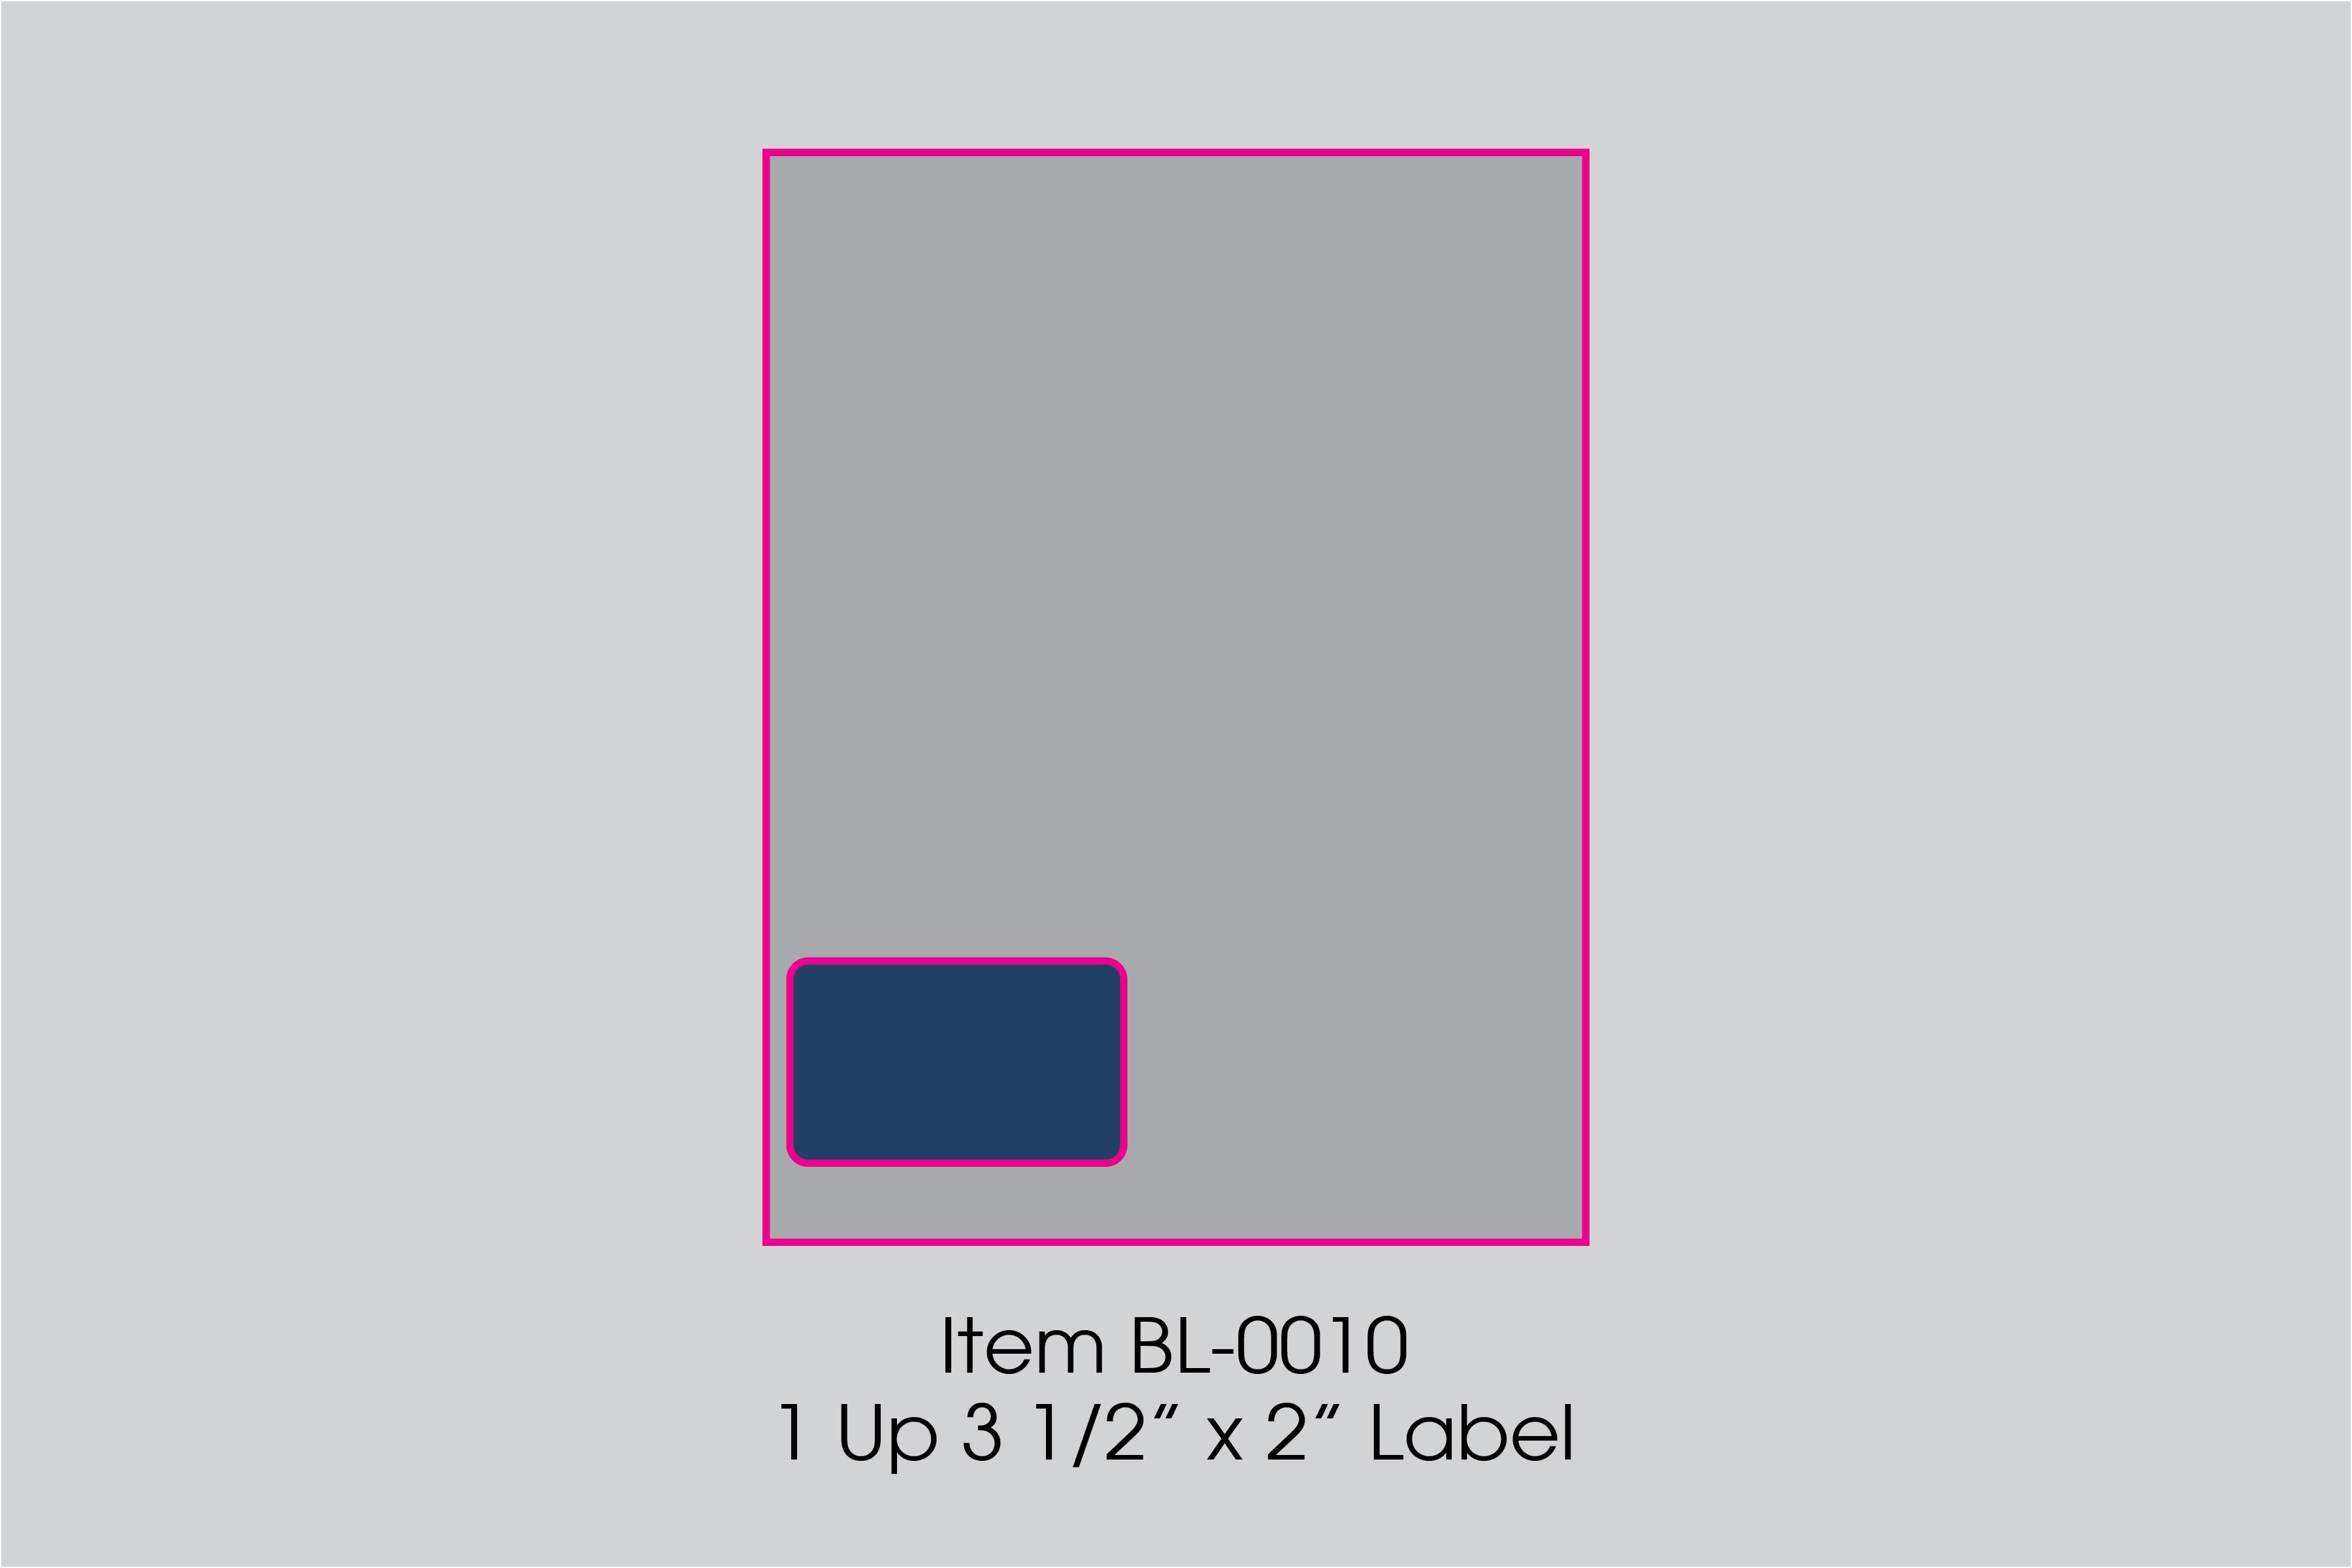 BL-0010